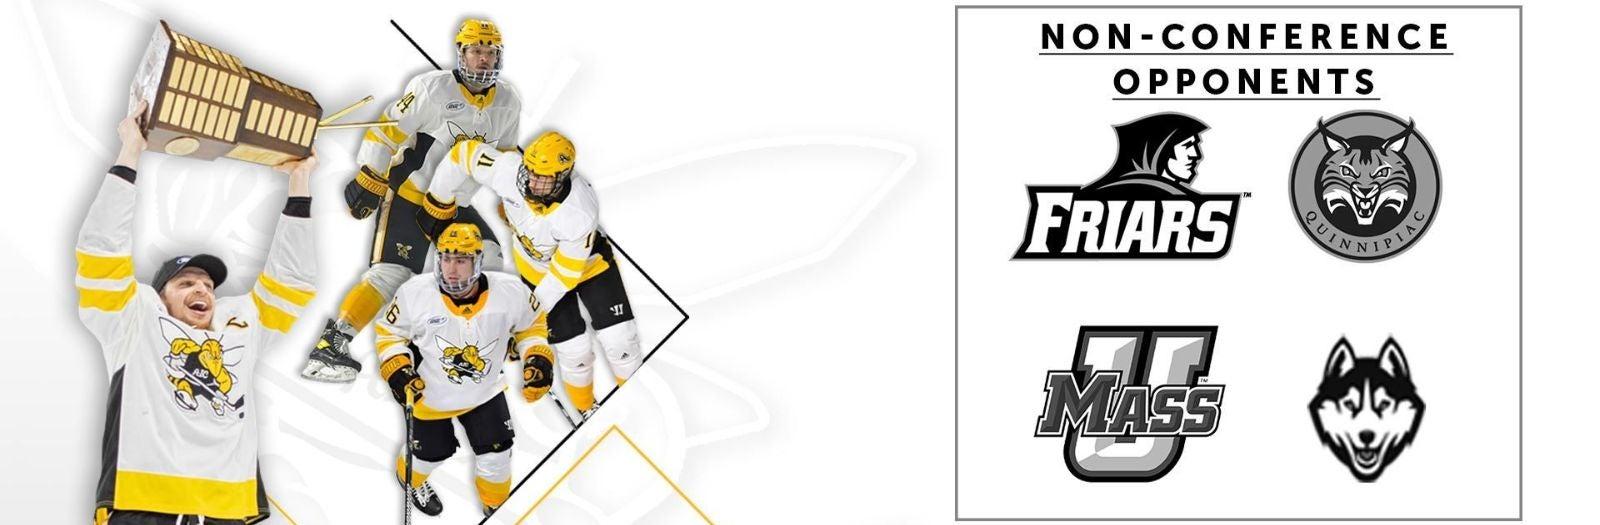 AIC Men's Hockey vs. Providence College